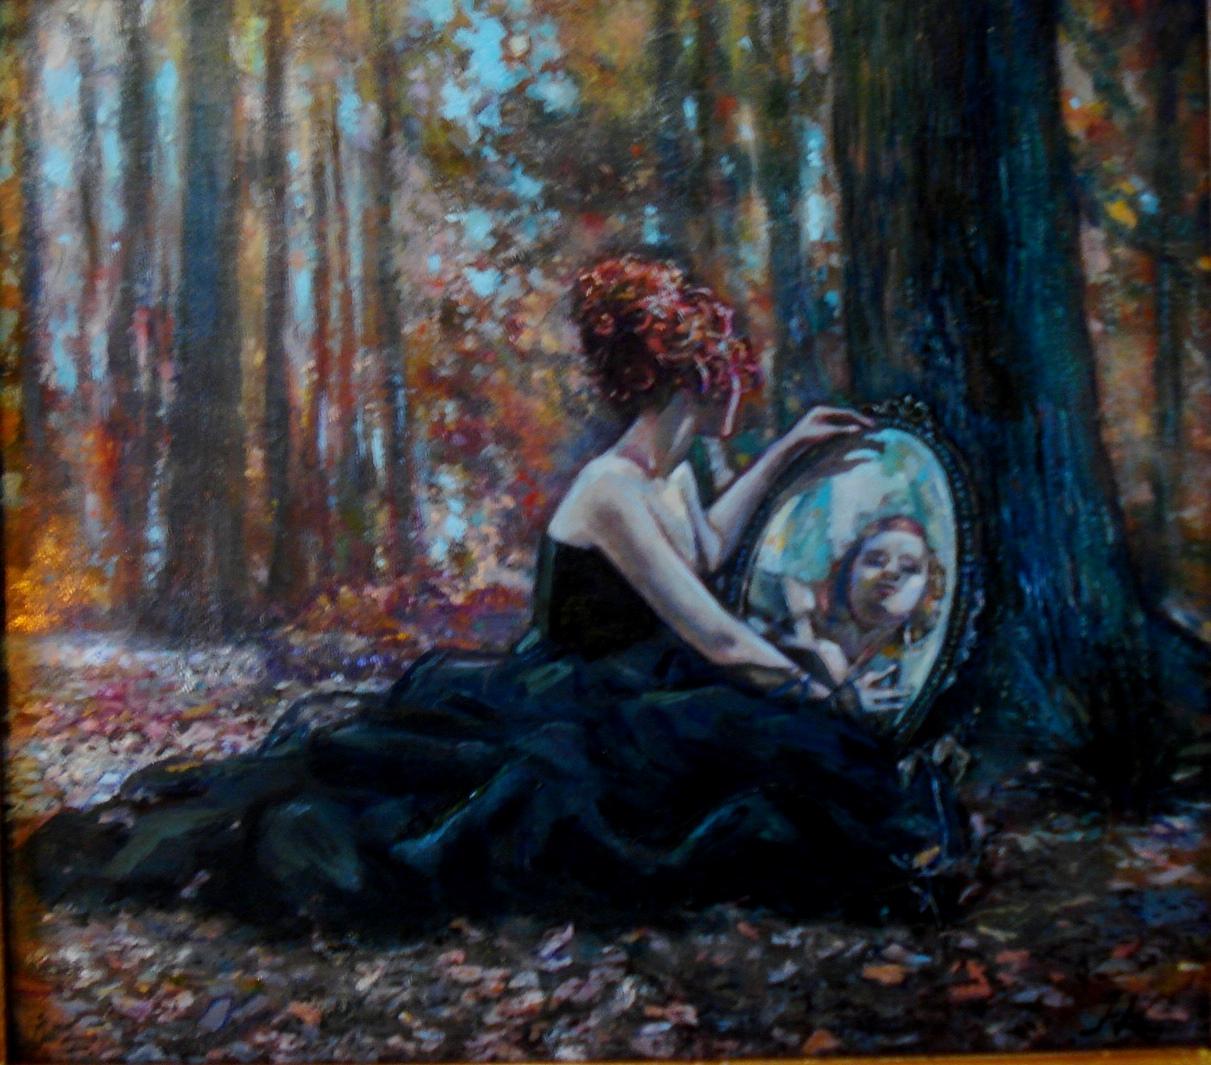 Rudens spogulis